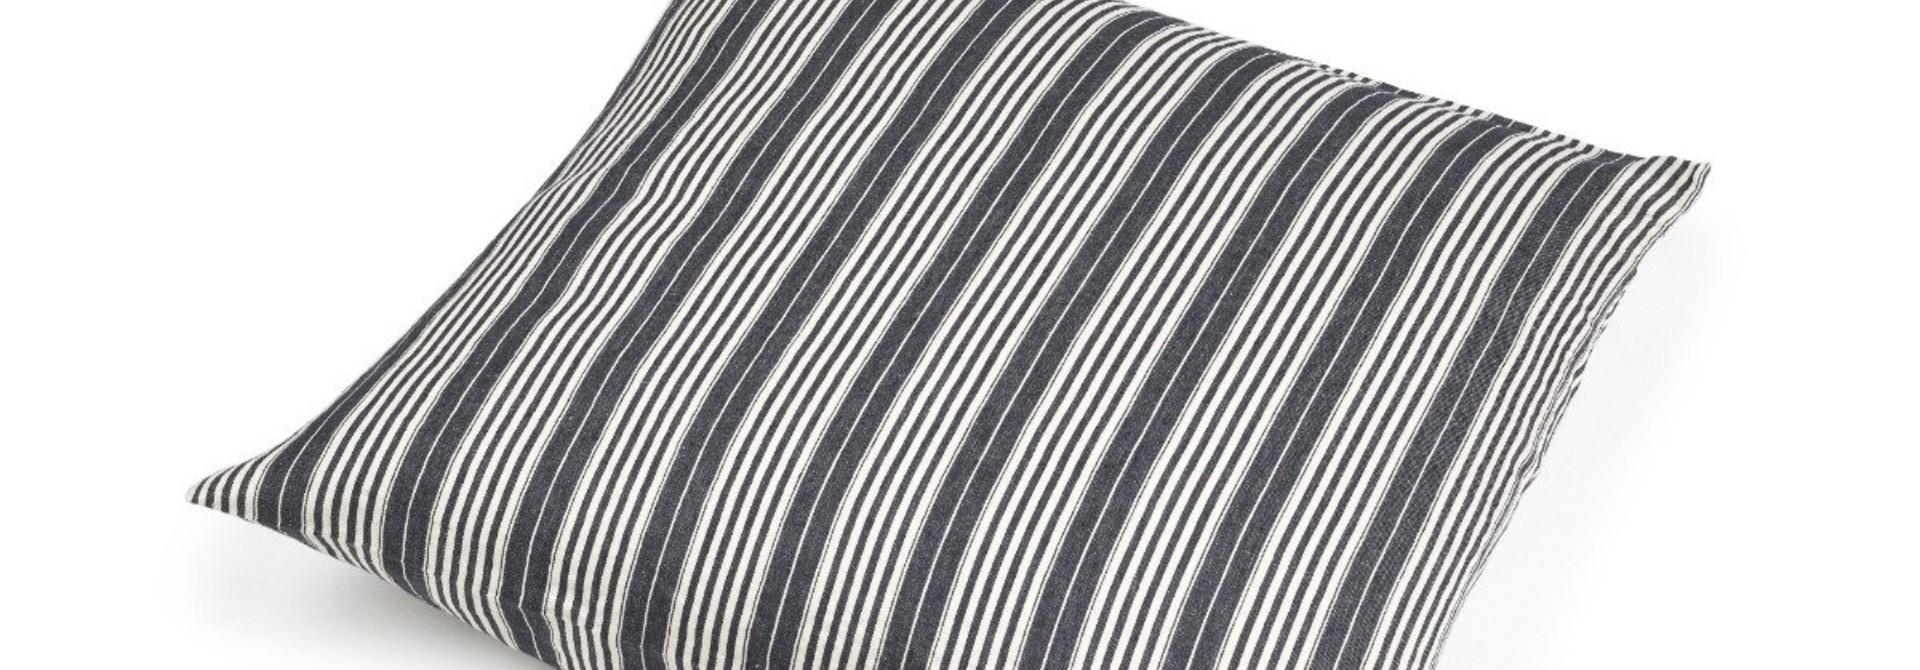 Pillow  Sham- The Tack Stripe - Euro